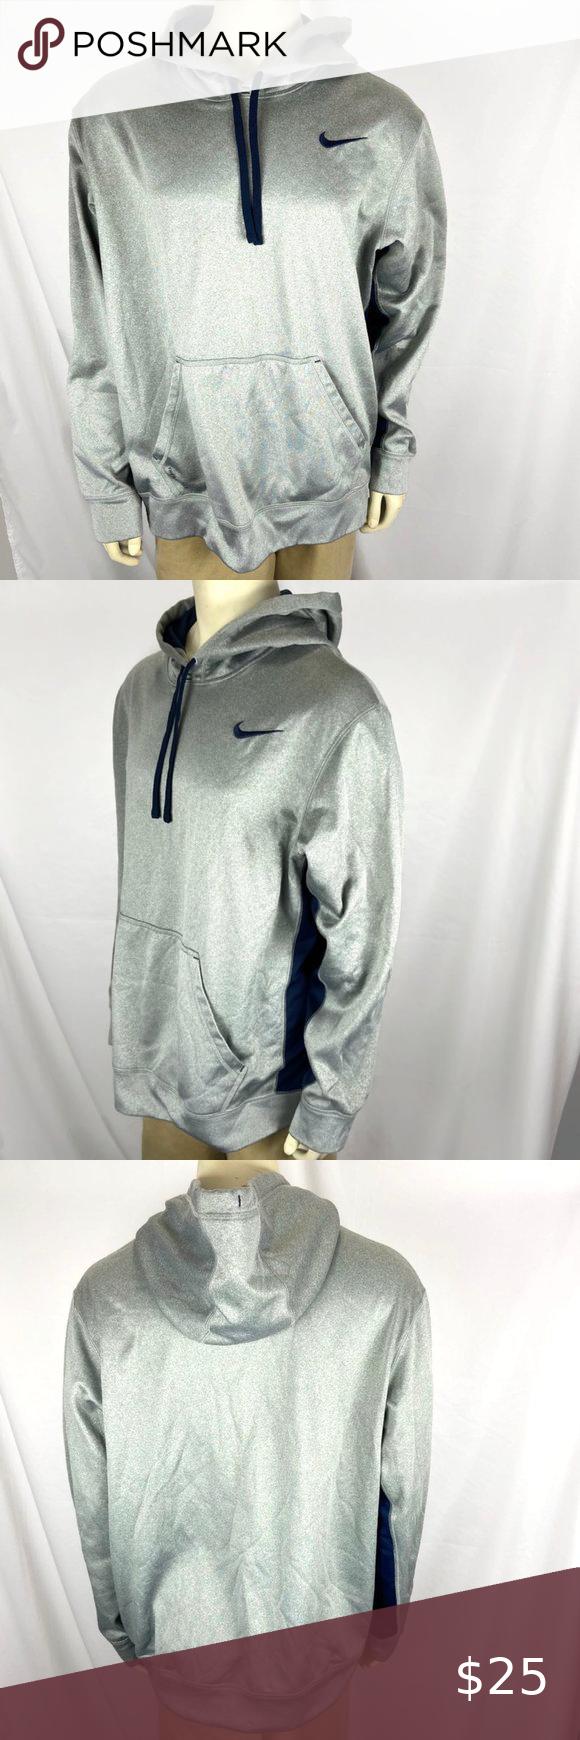 Nike Mens Xl Therma Fit Hoodie Pullover Sweatshirt Nike Therma Fit Hooded Sweatshirt Gray Blue Xl Chest 25 Lengt Workout Hoodie Sweatshirts Pullover Hoodie [ 1740 x 580 Pixel ]